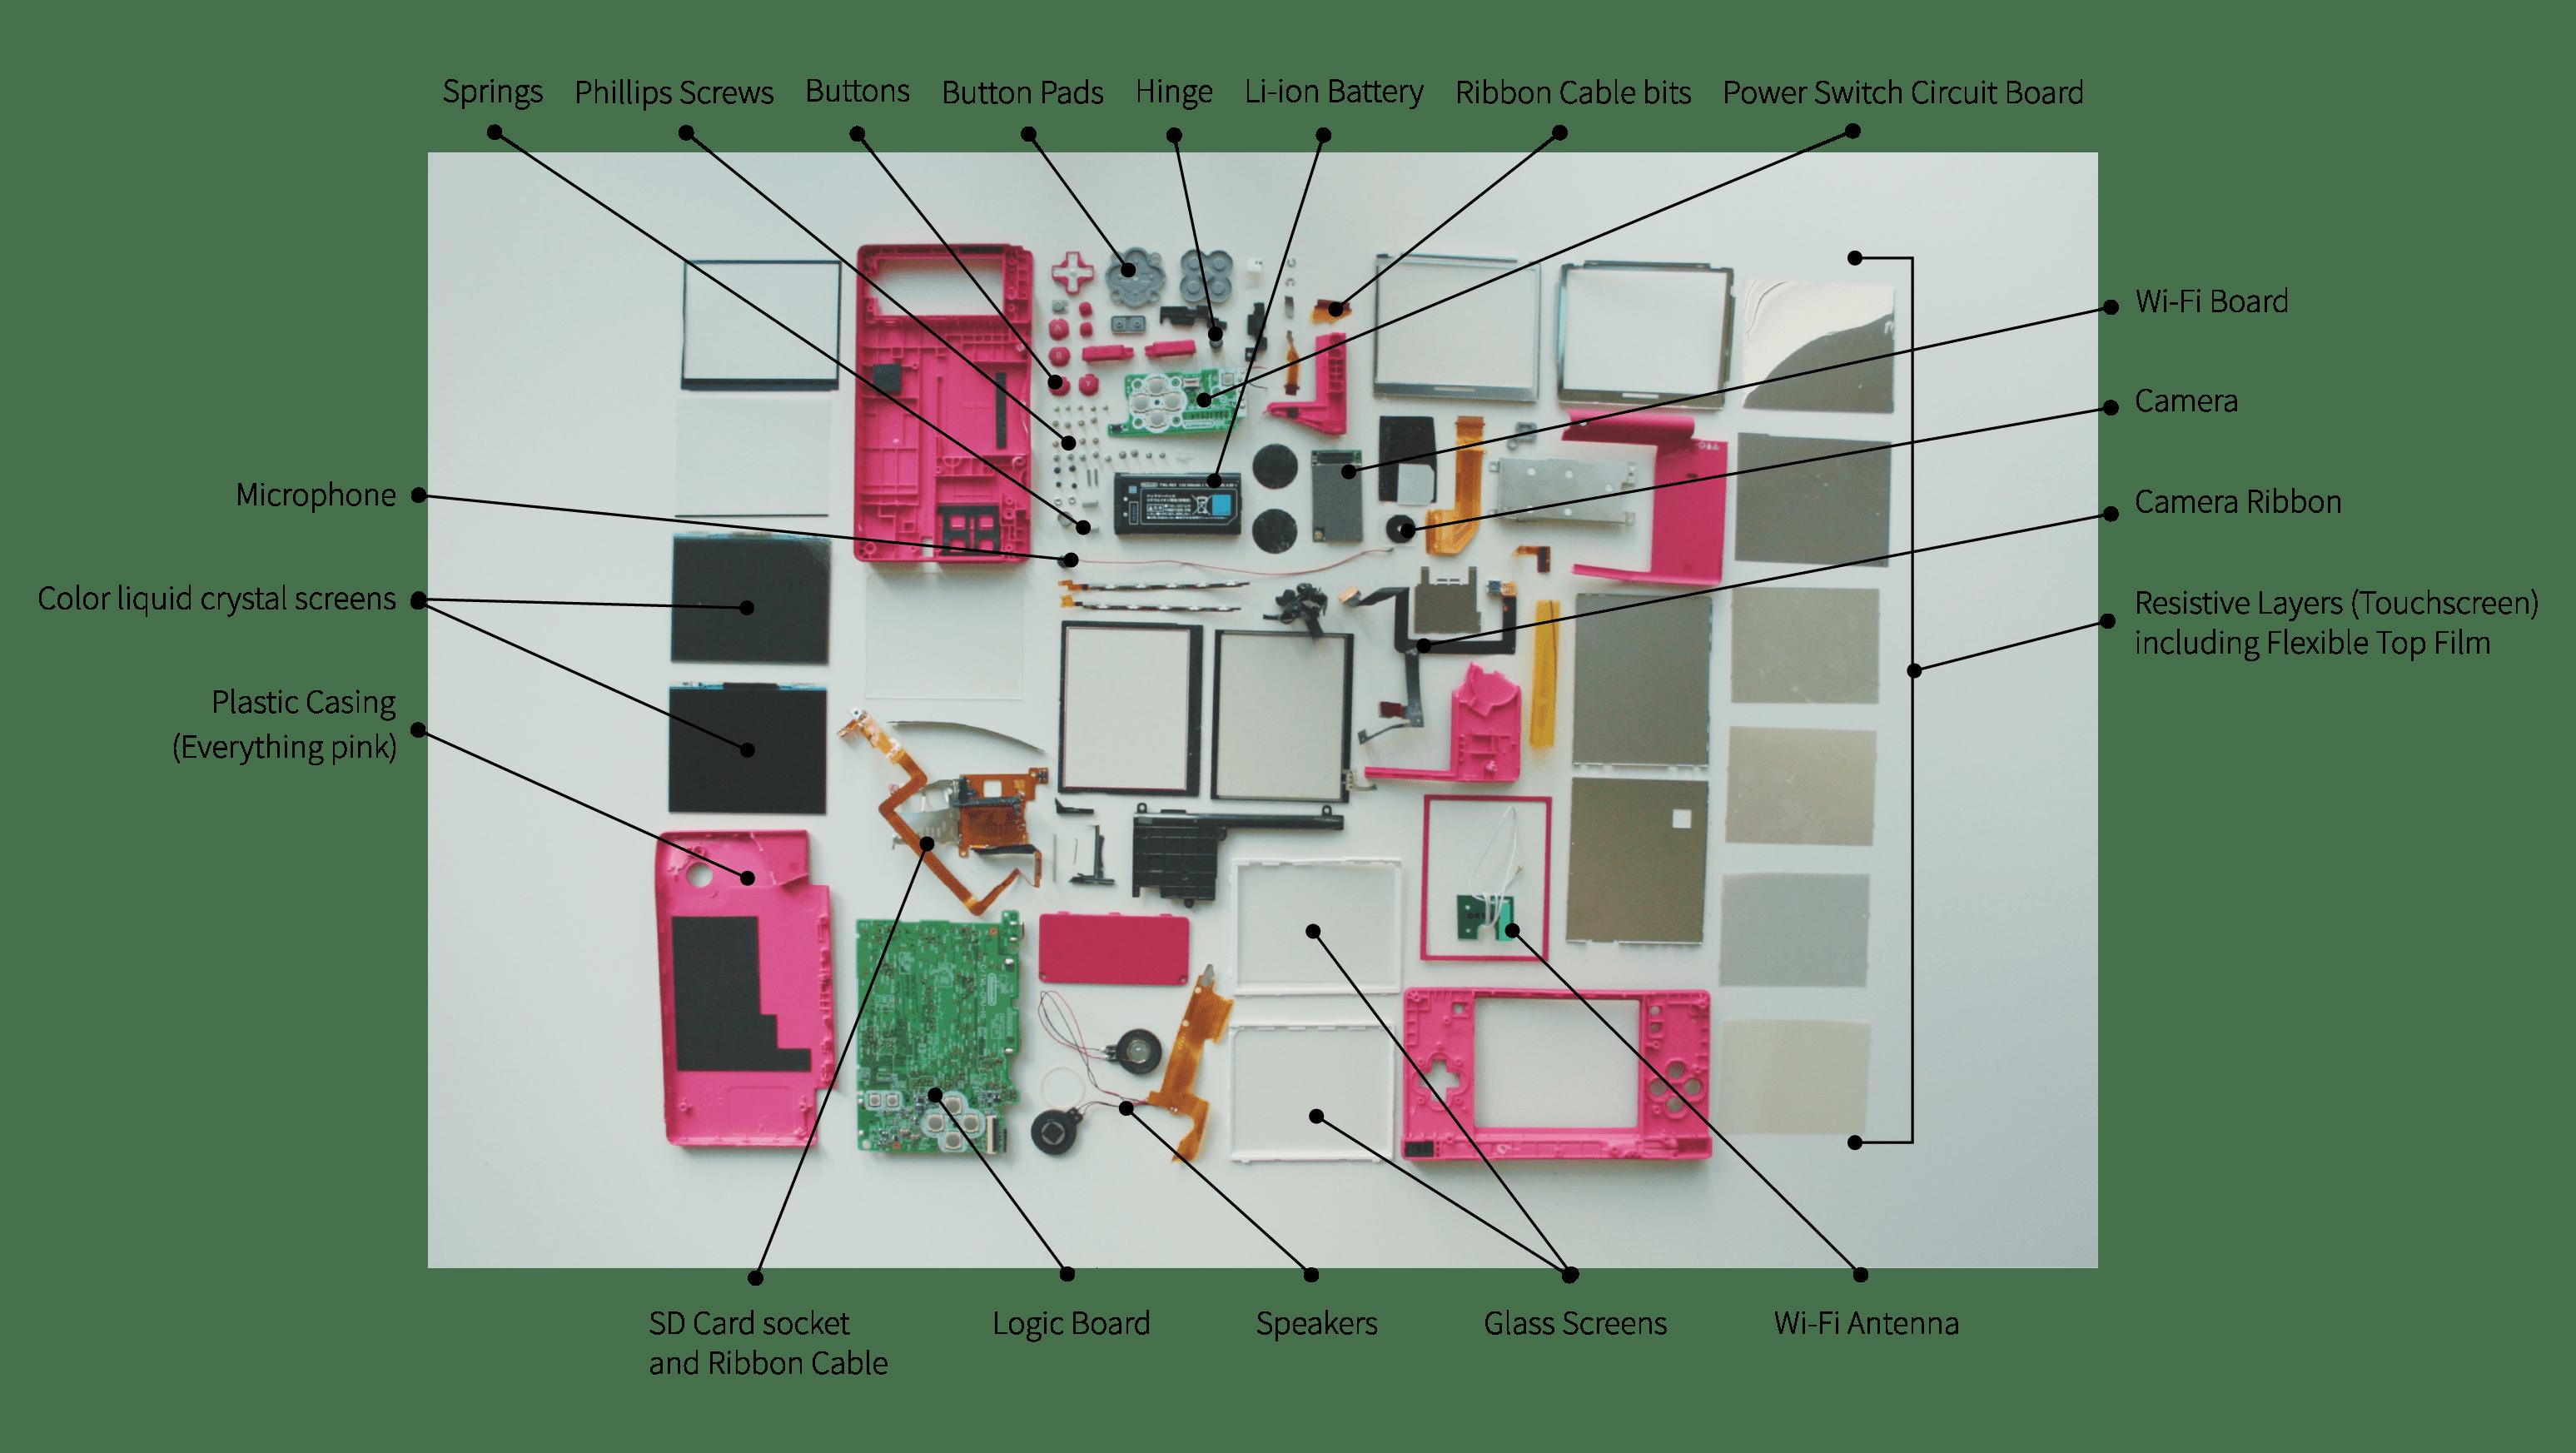 Nintendo 3ds Circuit Diagram Electric Games Dsi Teardown Making Studio Rh Makingstudio Blog Wii